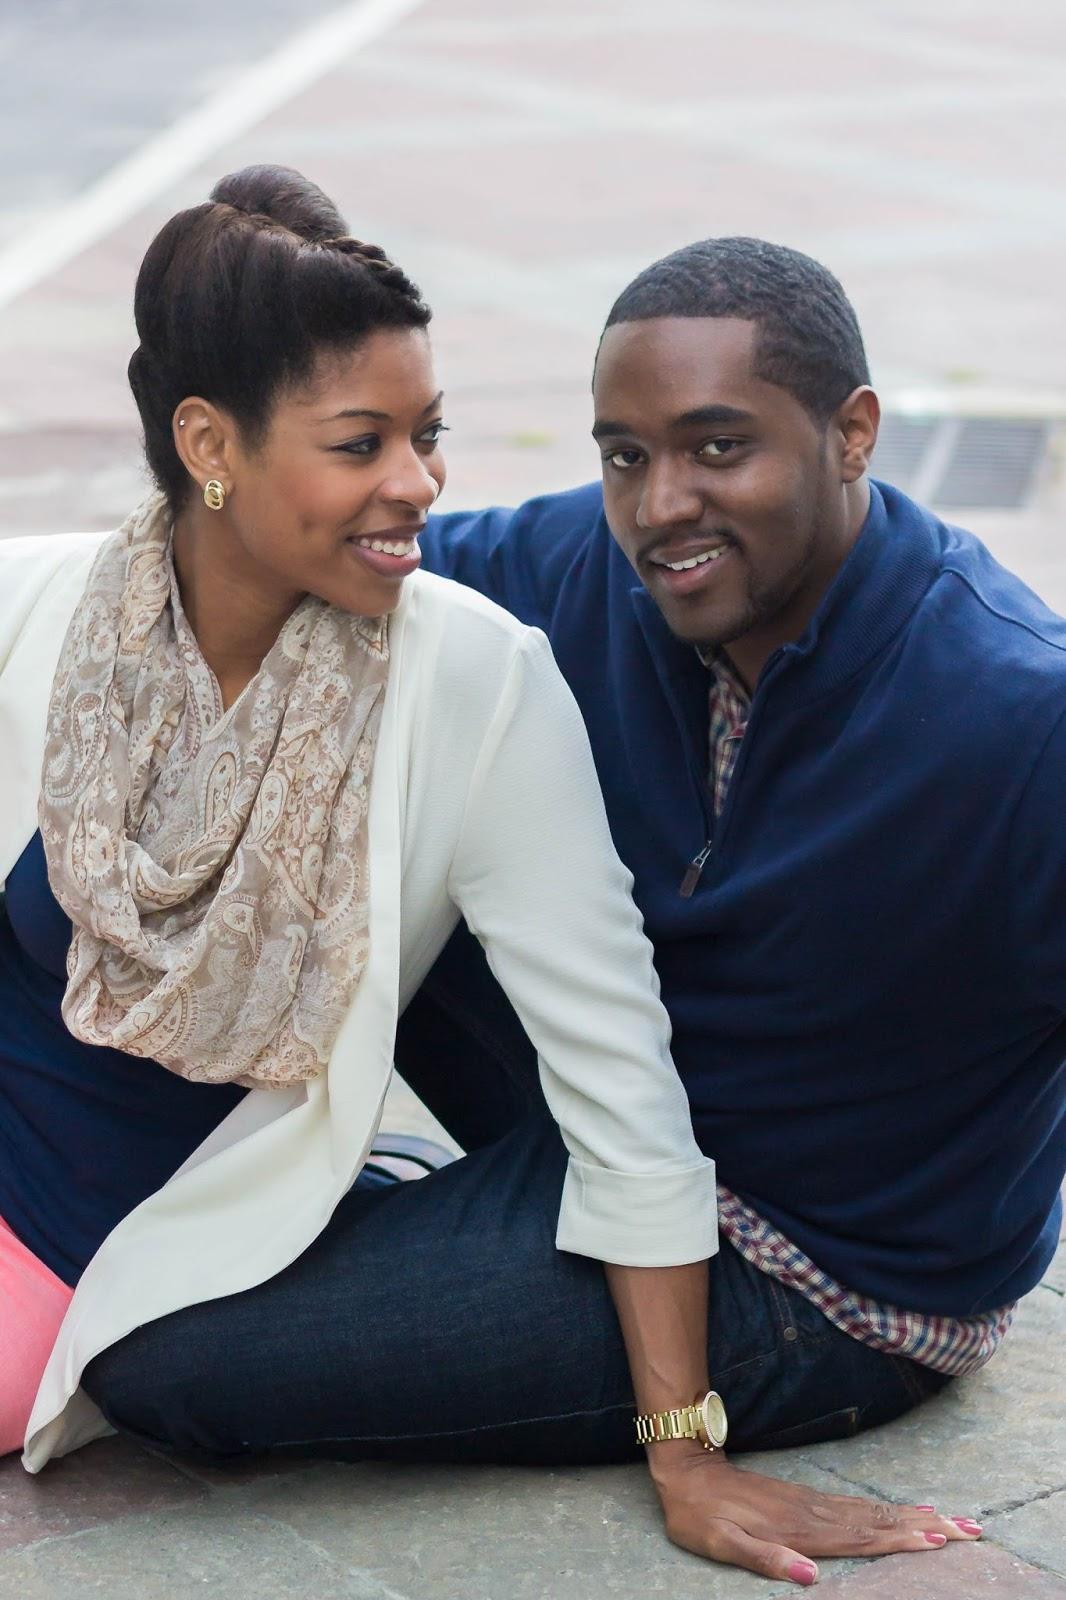 bryant-tyson-photography-mini-couples-session-greenville-nc-photographer-chris-courtney-10.jpg